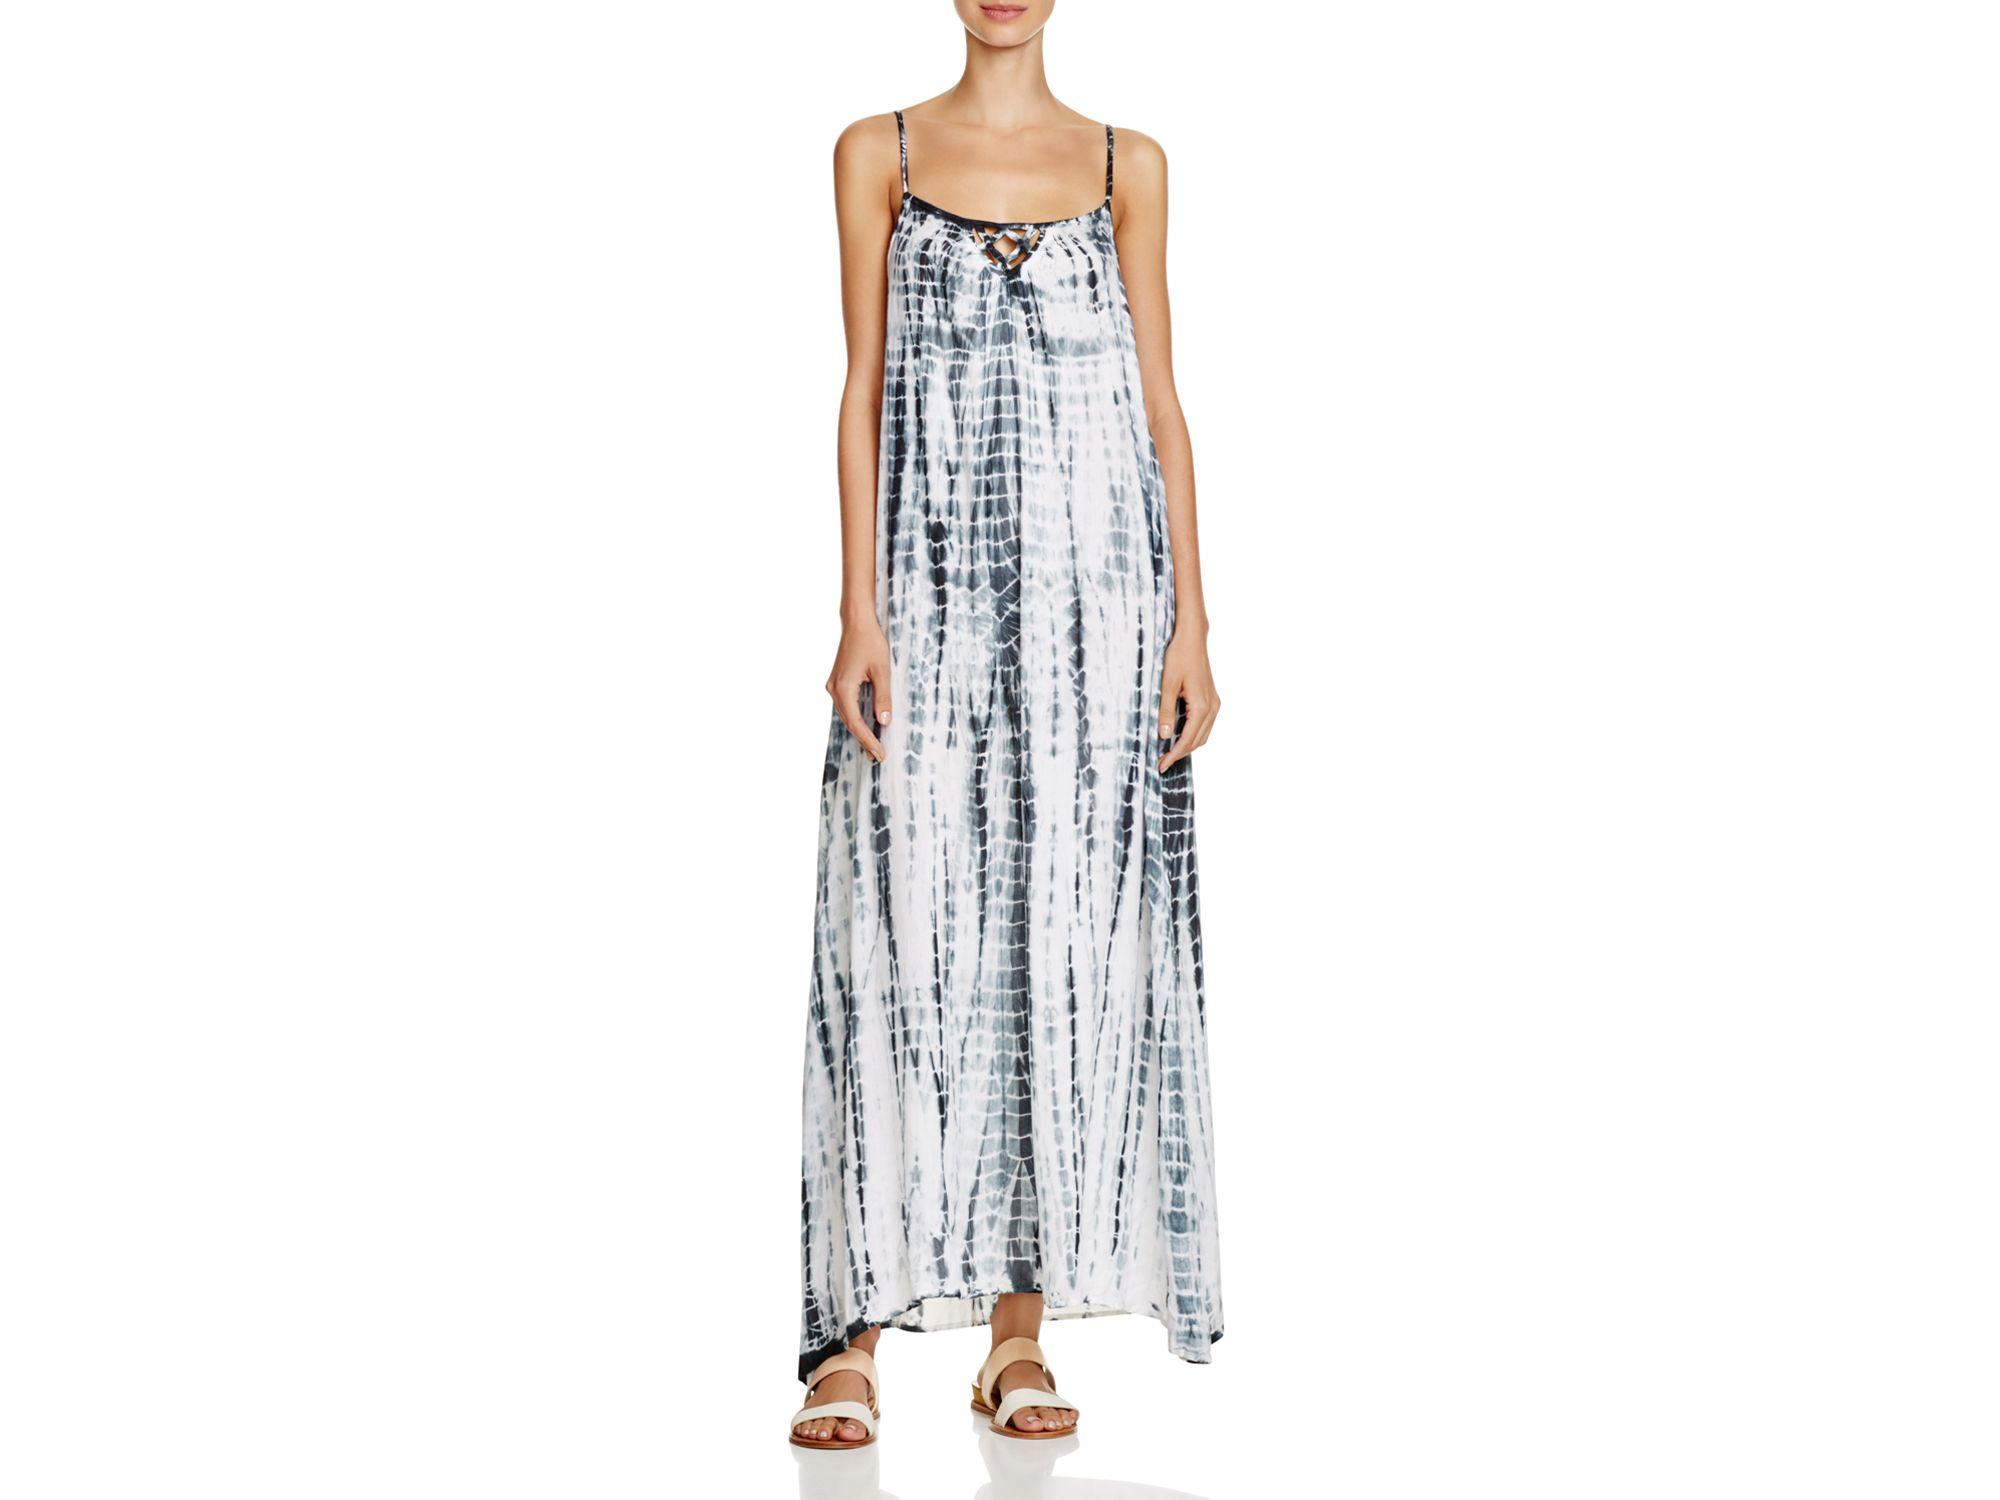 ca86b76327 Lyst - Surf Gypsy Tie Dye Maxi Dress Swim Cover Up in Gray